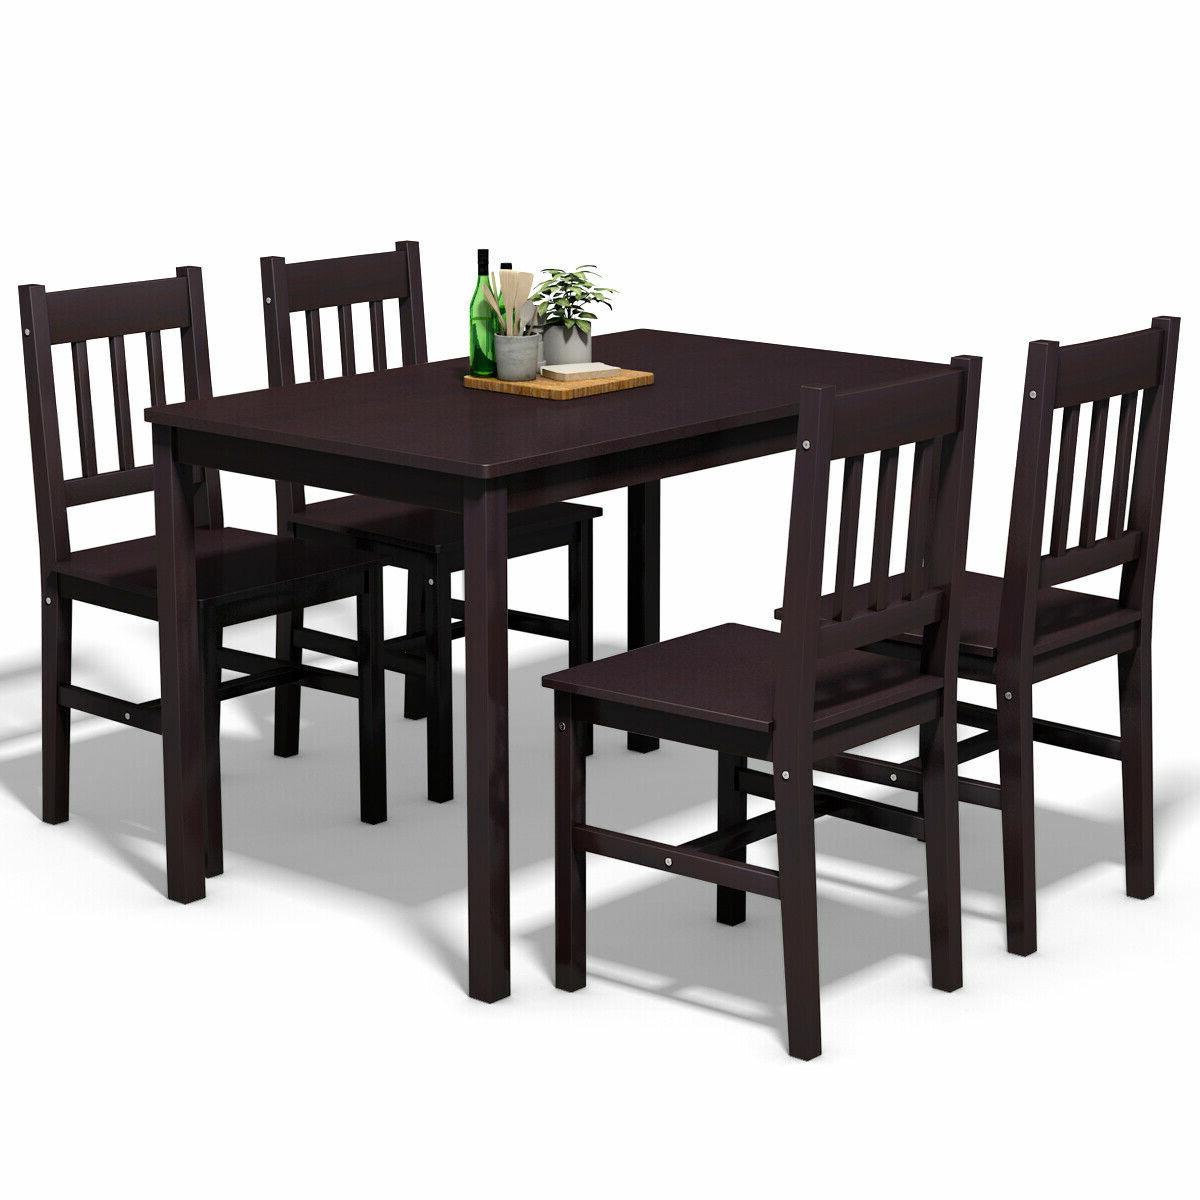 Most Recent Pattonsburg 5 Piece Dining Sets Regarding Sundberg 5 Piece Solid Wood Dining Set (View 8 of 20)